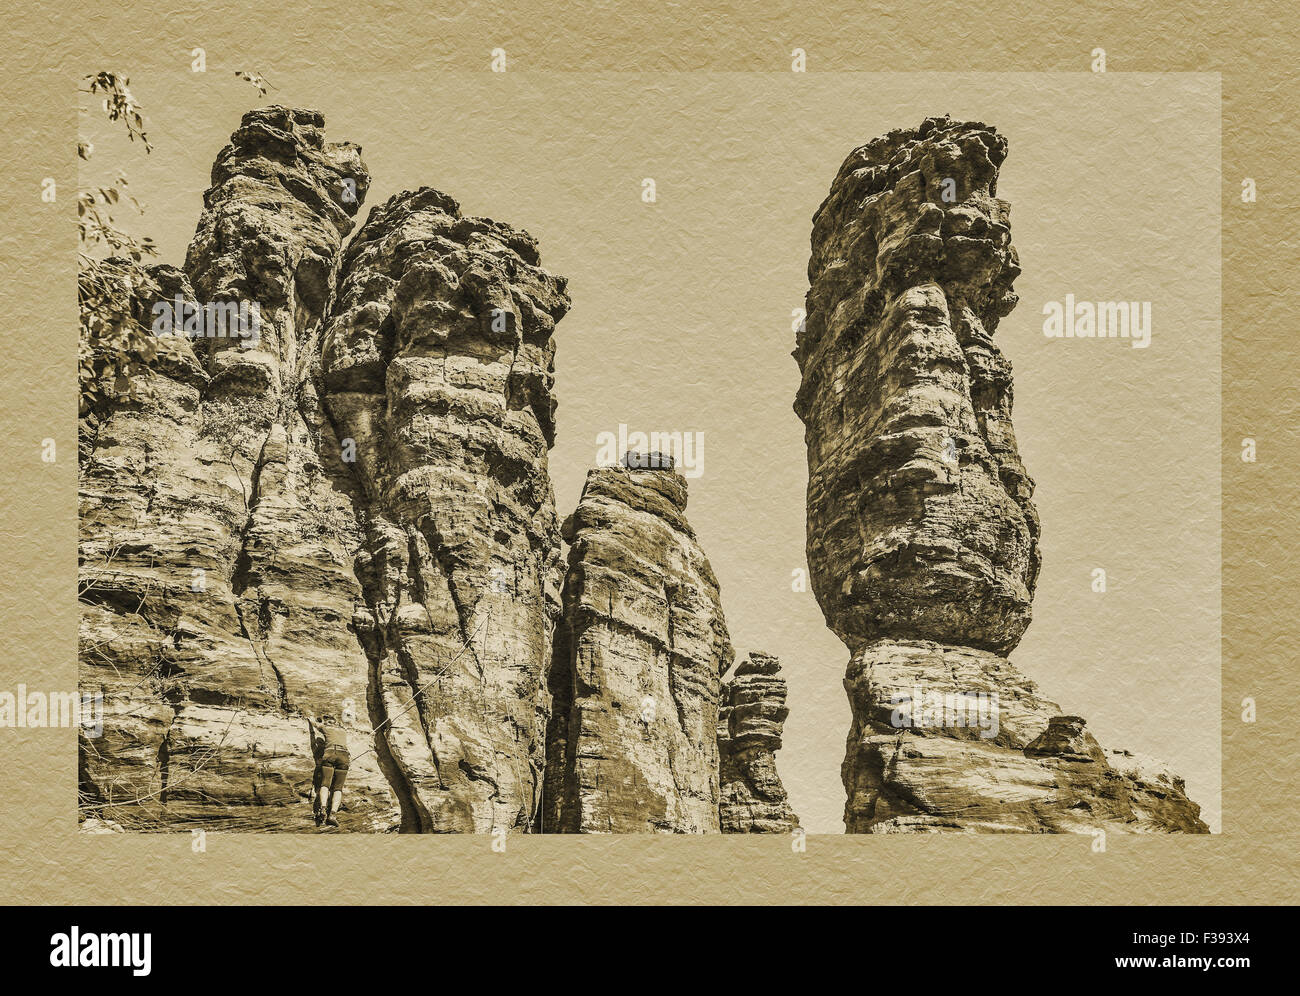 Pillars of Hercules are two bizarre, free-standing rock towers in Rosenthal Bielatal, Saxon Switzerland, Saxony, - Stock Image